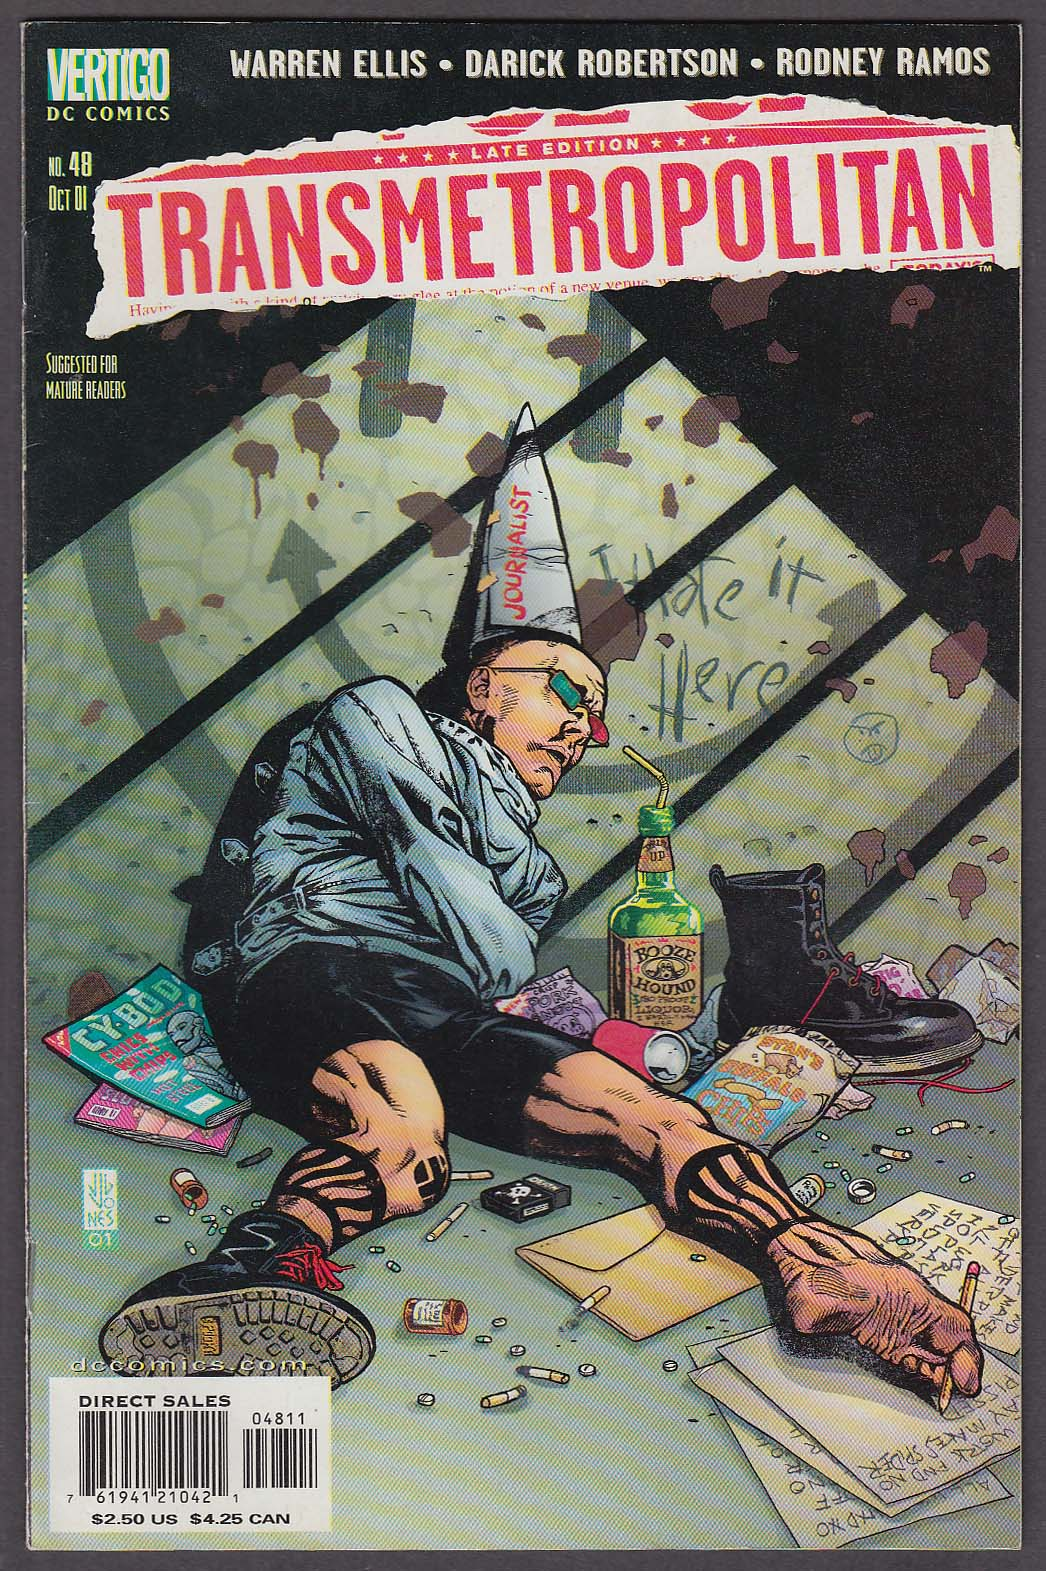 Image for TRANSMETROPOLITAN #48 Vertigo comic book 10 2001